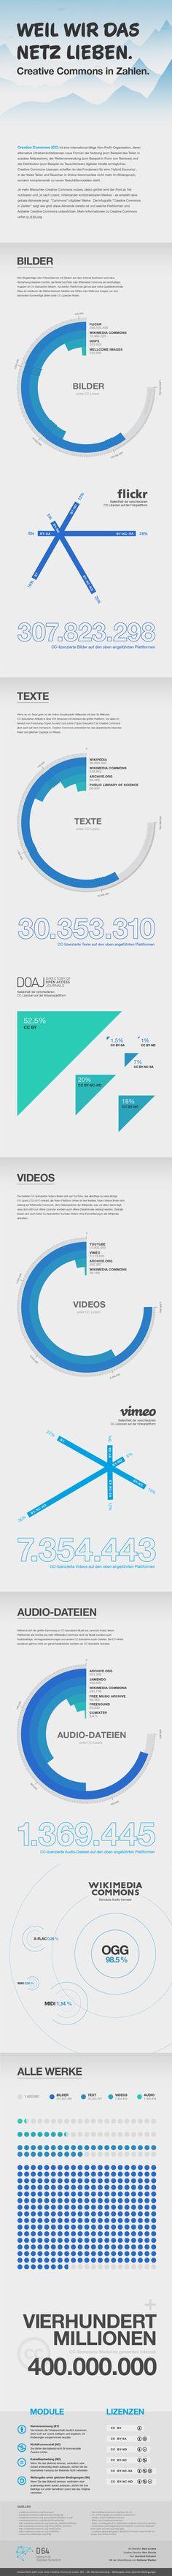 97 best Infografiken Deutsch images on Pinterest | Internet ...